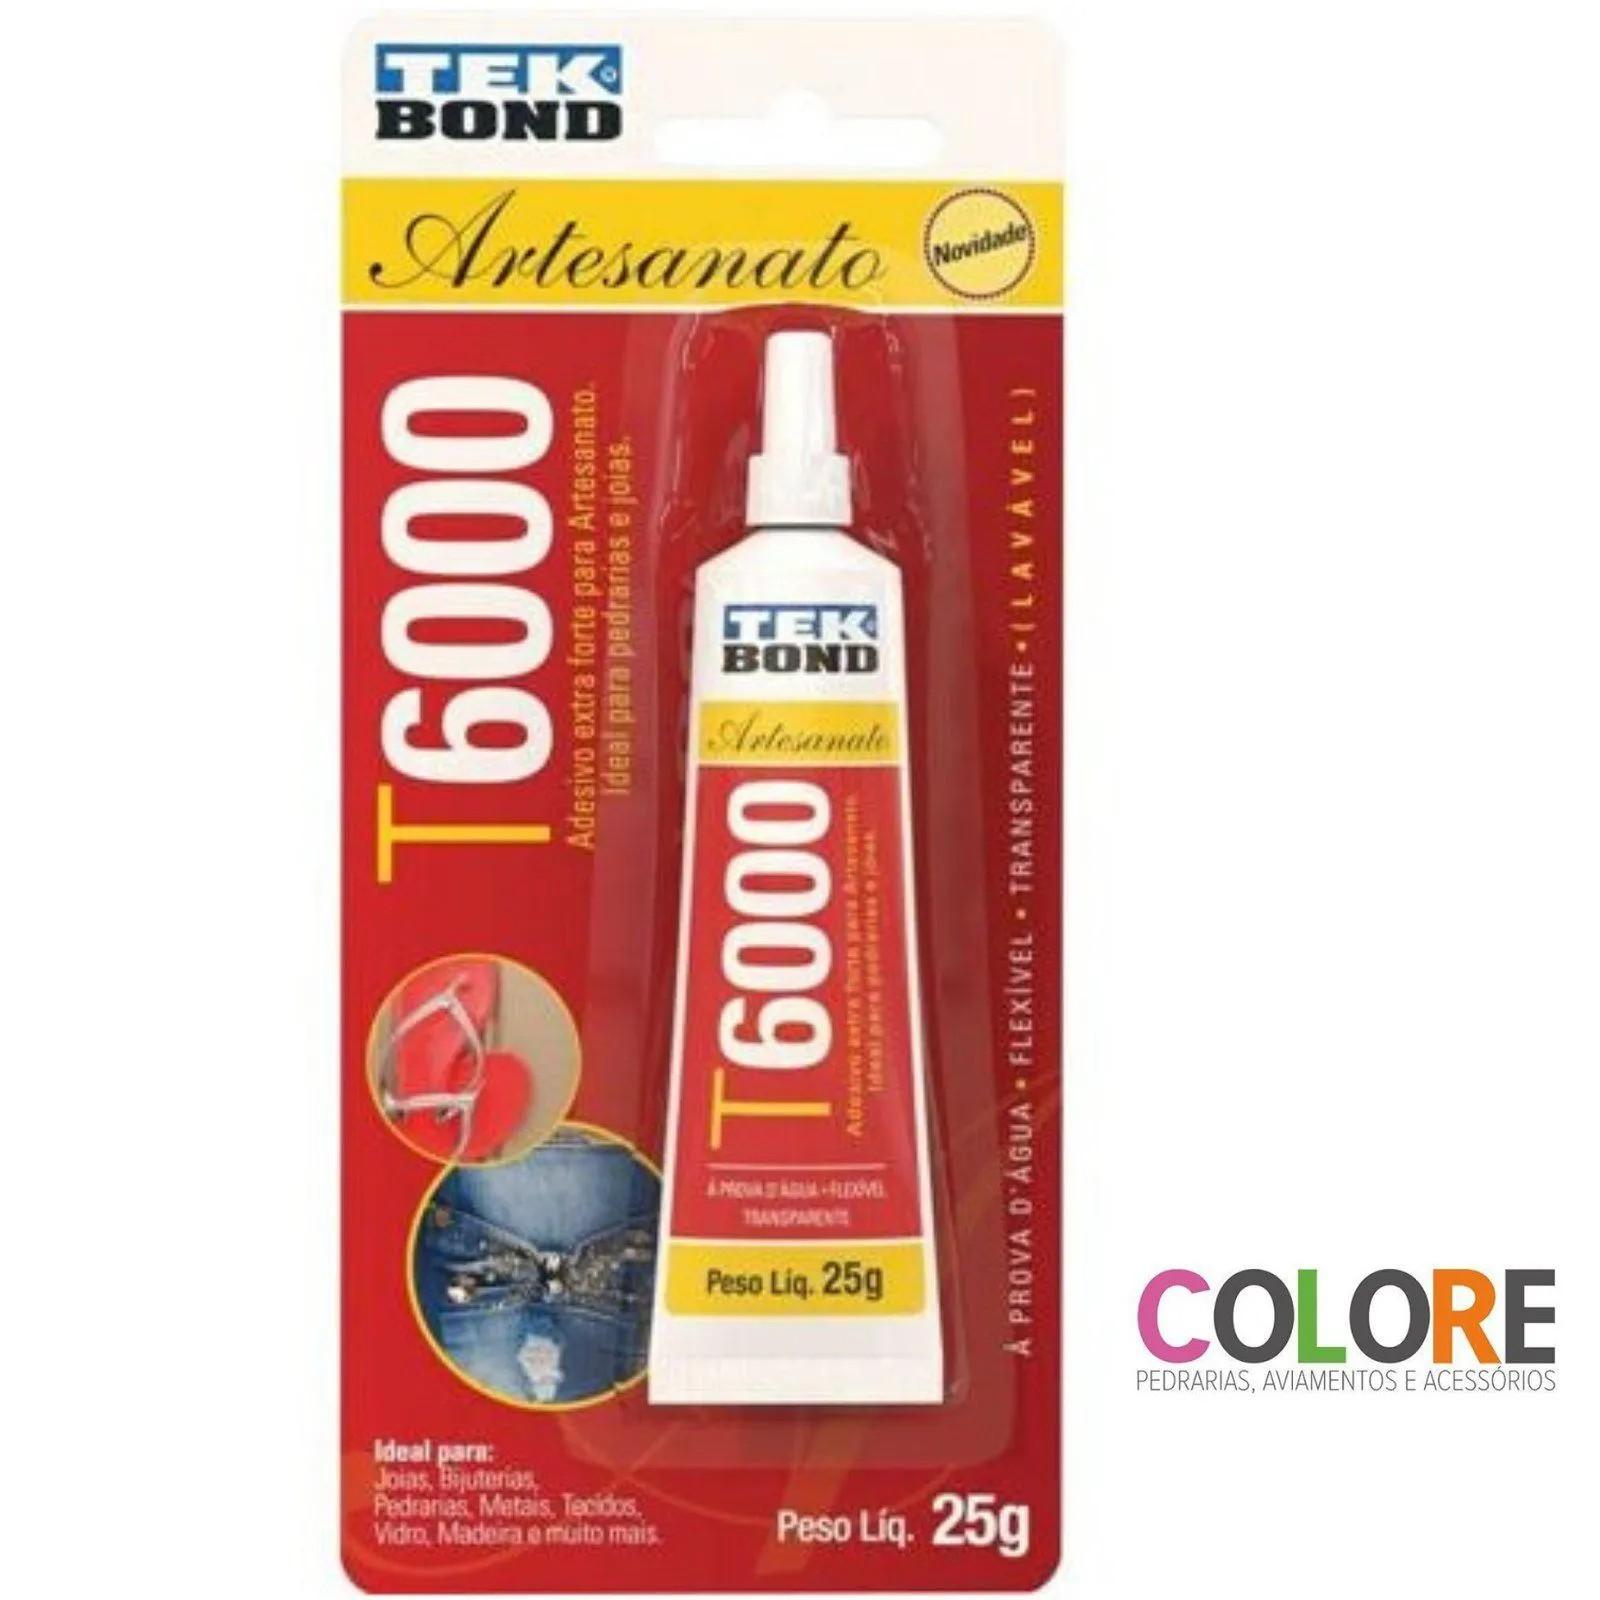 Cola T6000 Tekbond 25 gramas